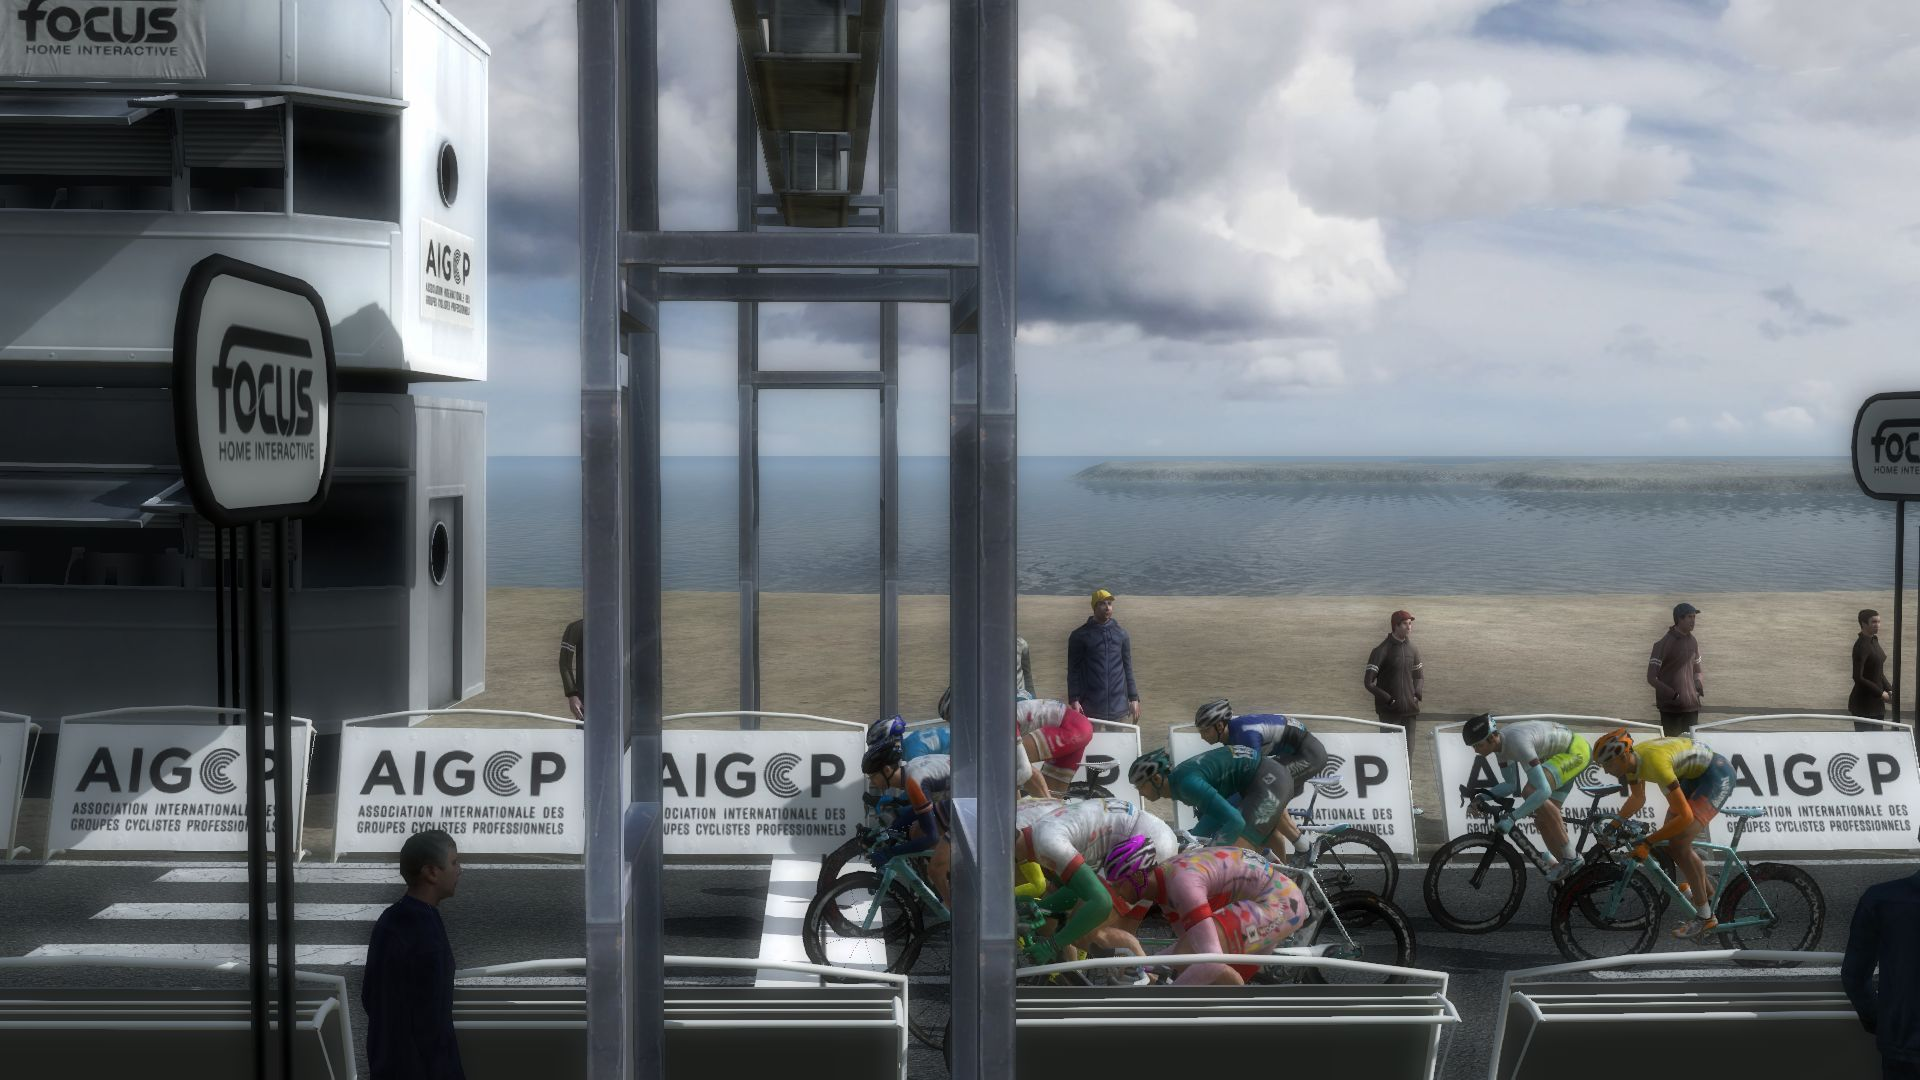 pcmdaily.com/images/mg/2019/Races/PT/Qatar/mg19_qat_s05_18.jpg